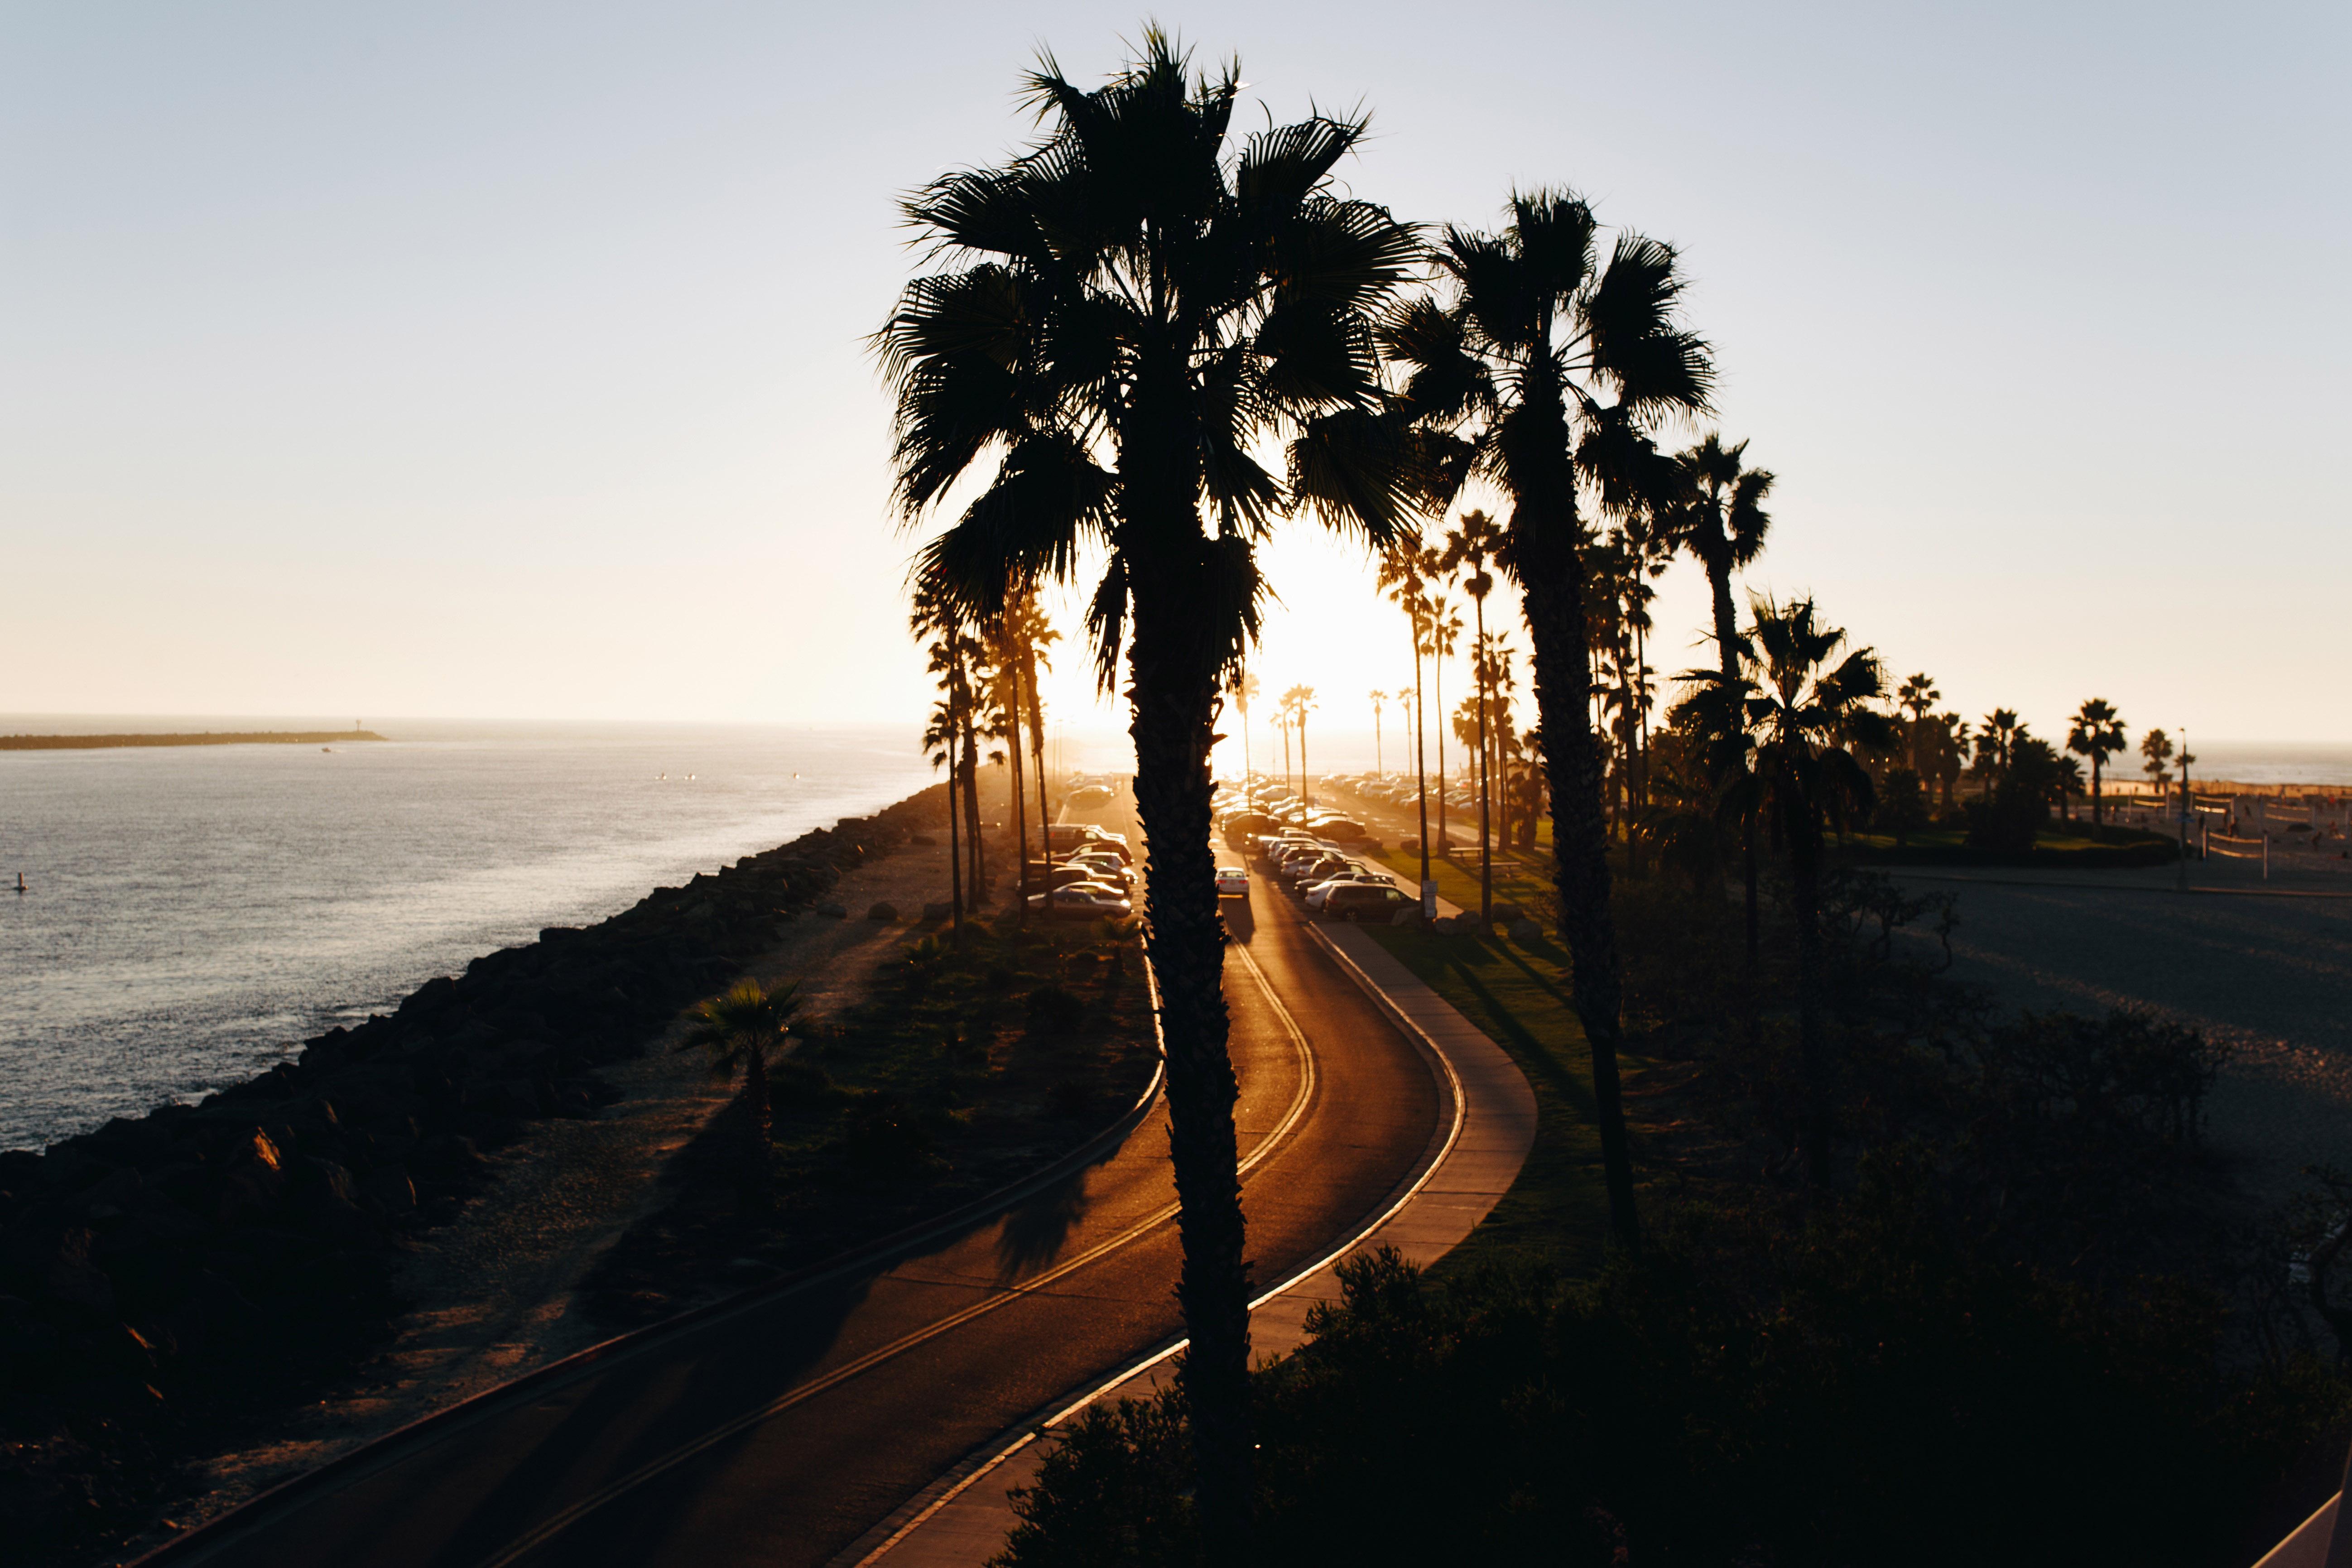 highway road landscape around san diego california image free